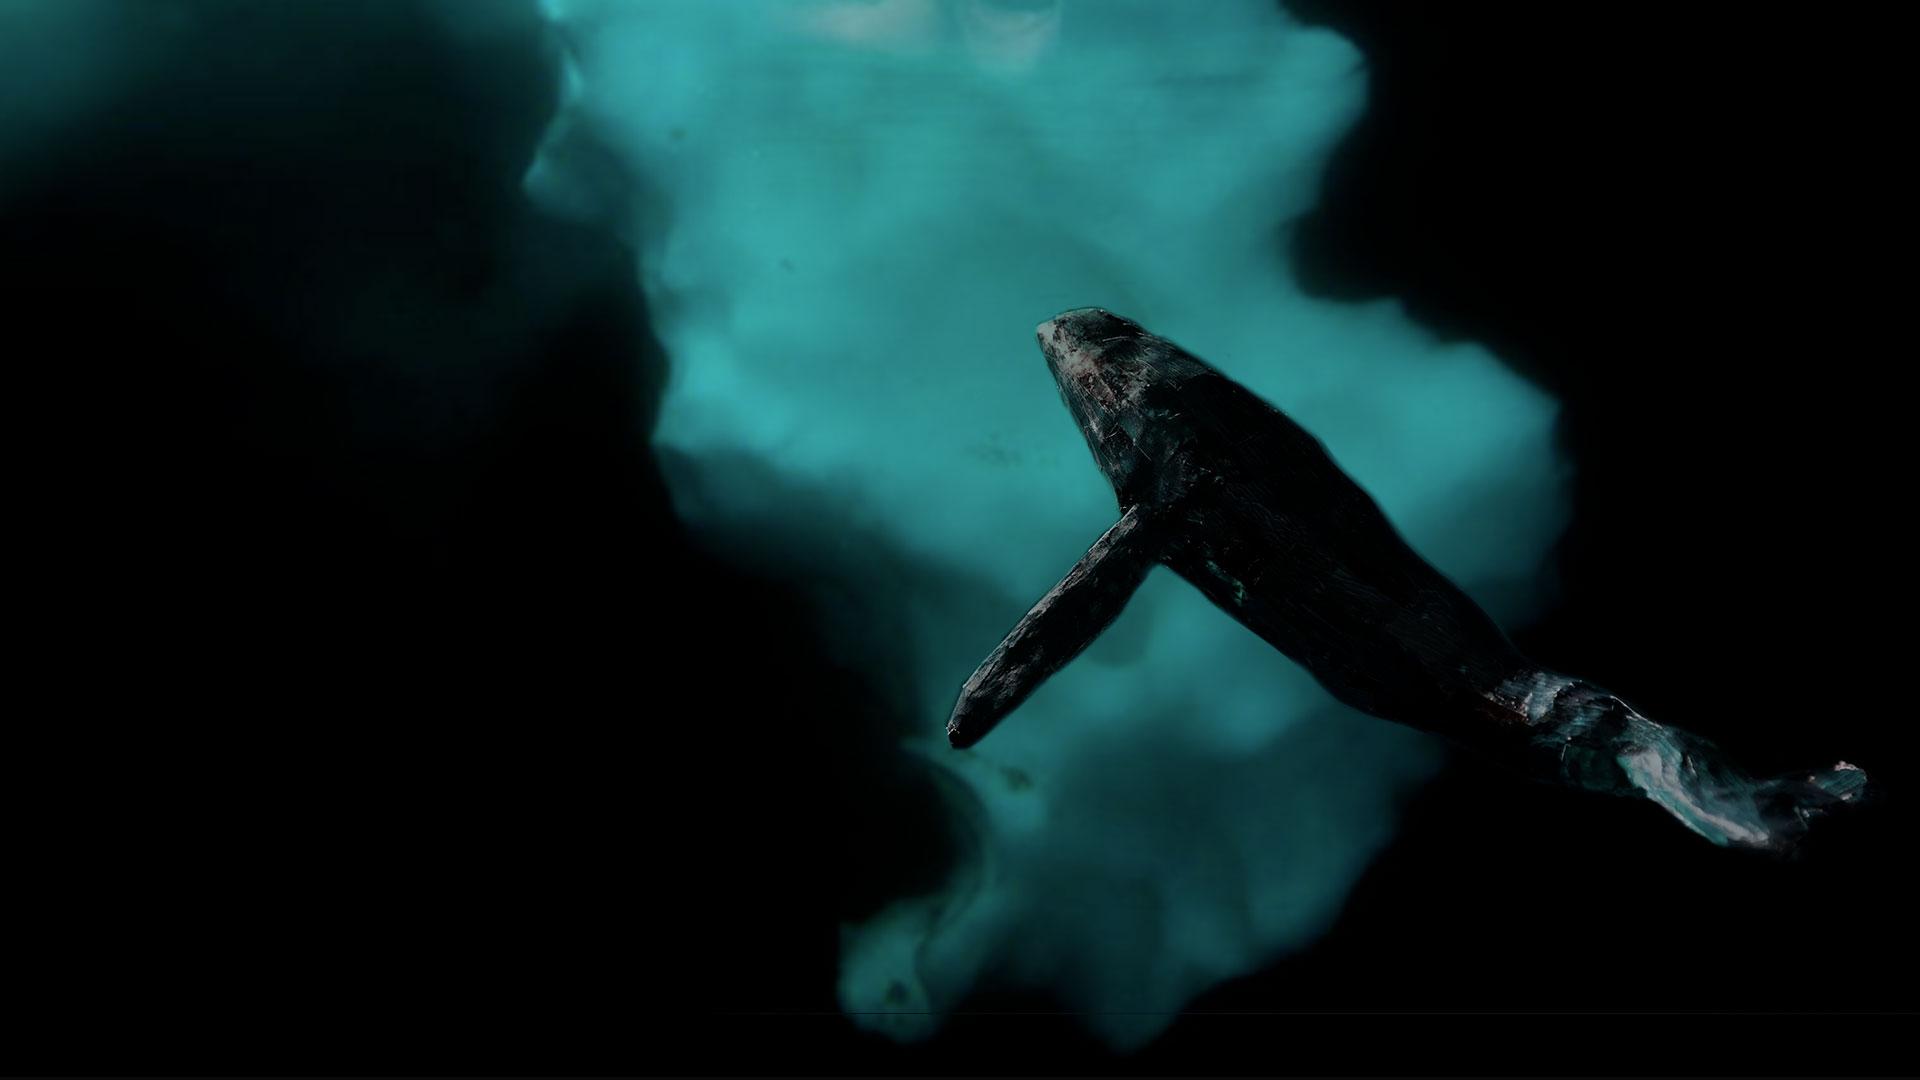 baleine ice-berg glace antarctique océan mer froid